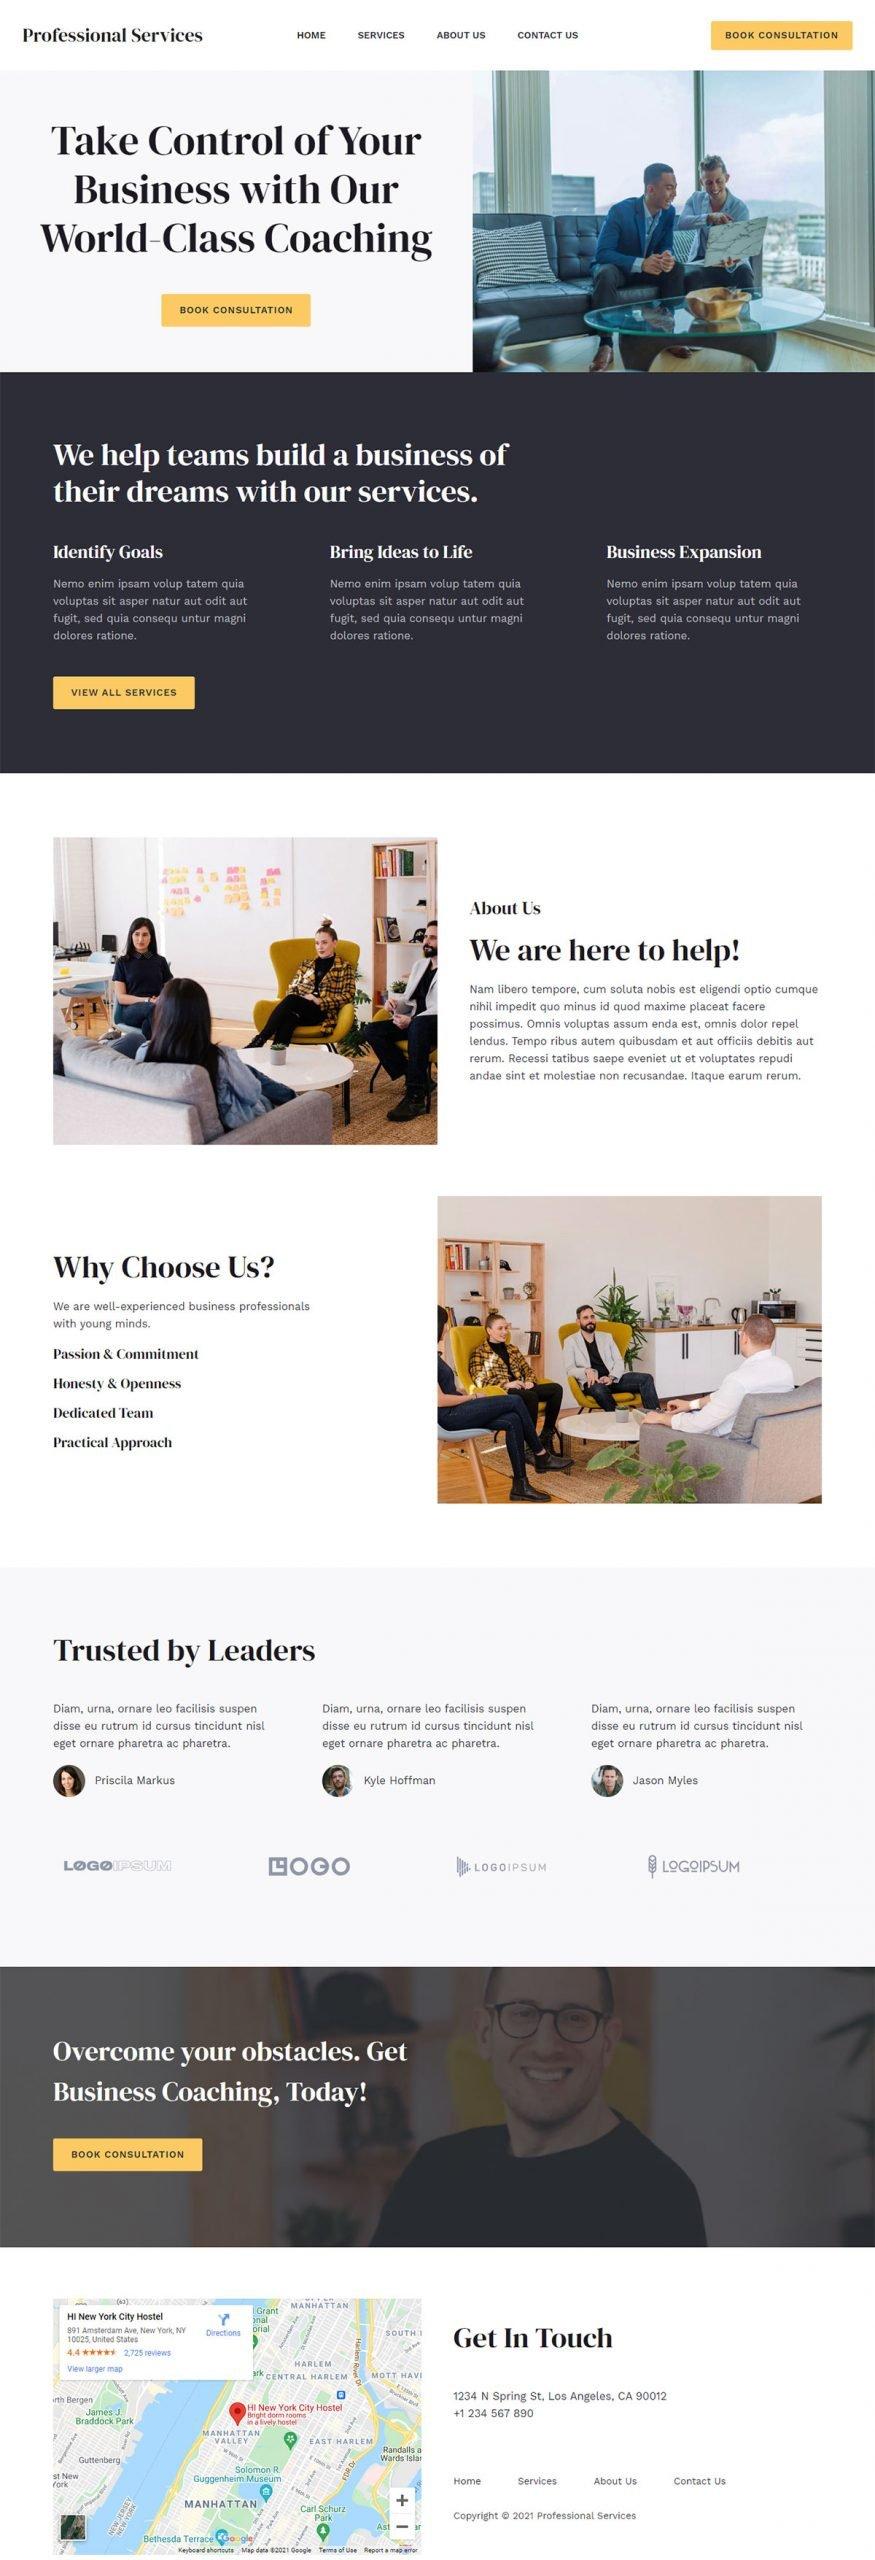 Adamo Web Design | Web Design Durham | professional services 02 1 scaled